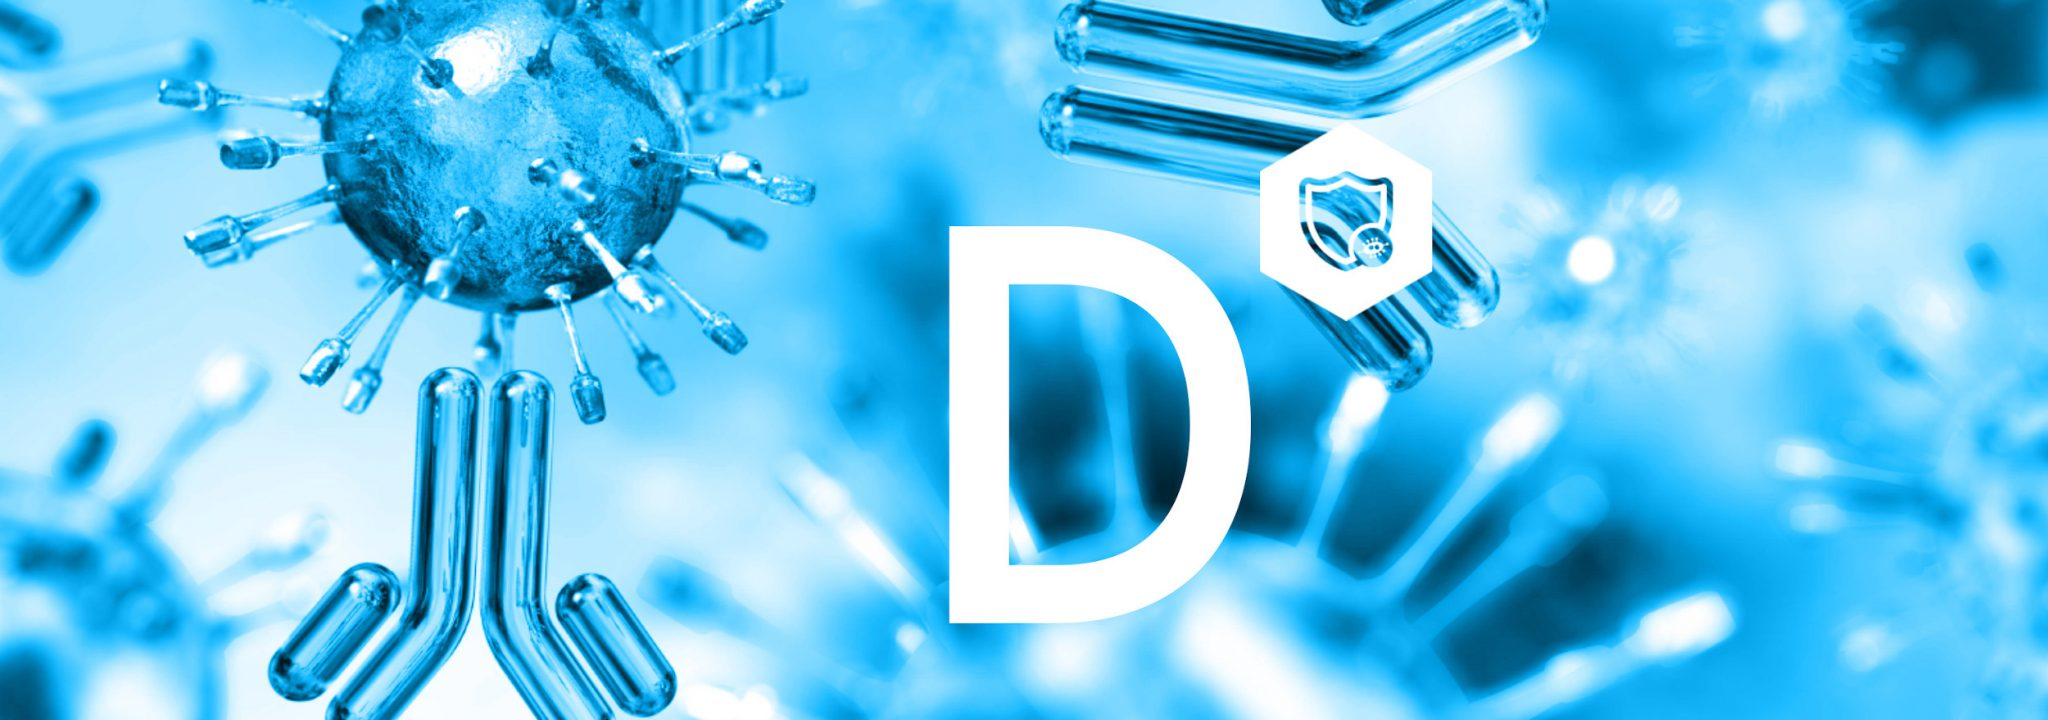 Vitamin D for immune support